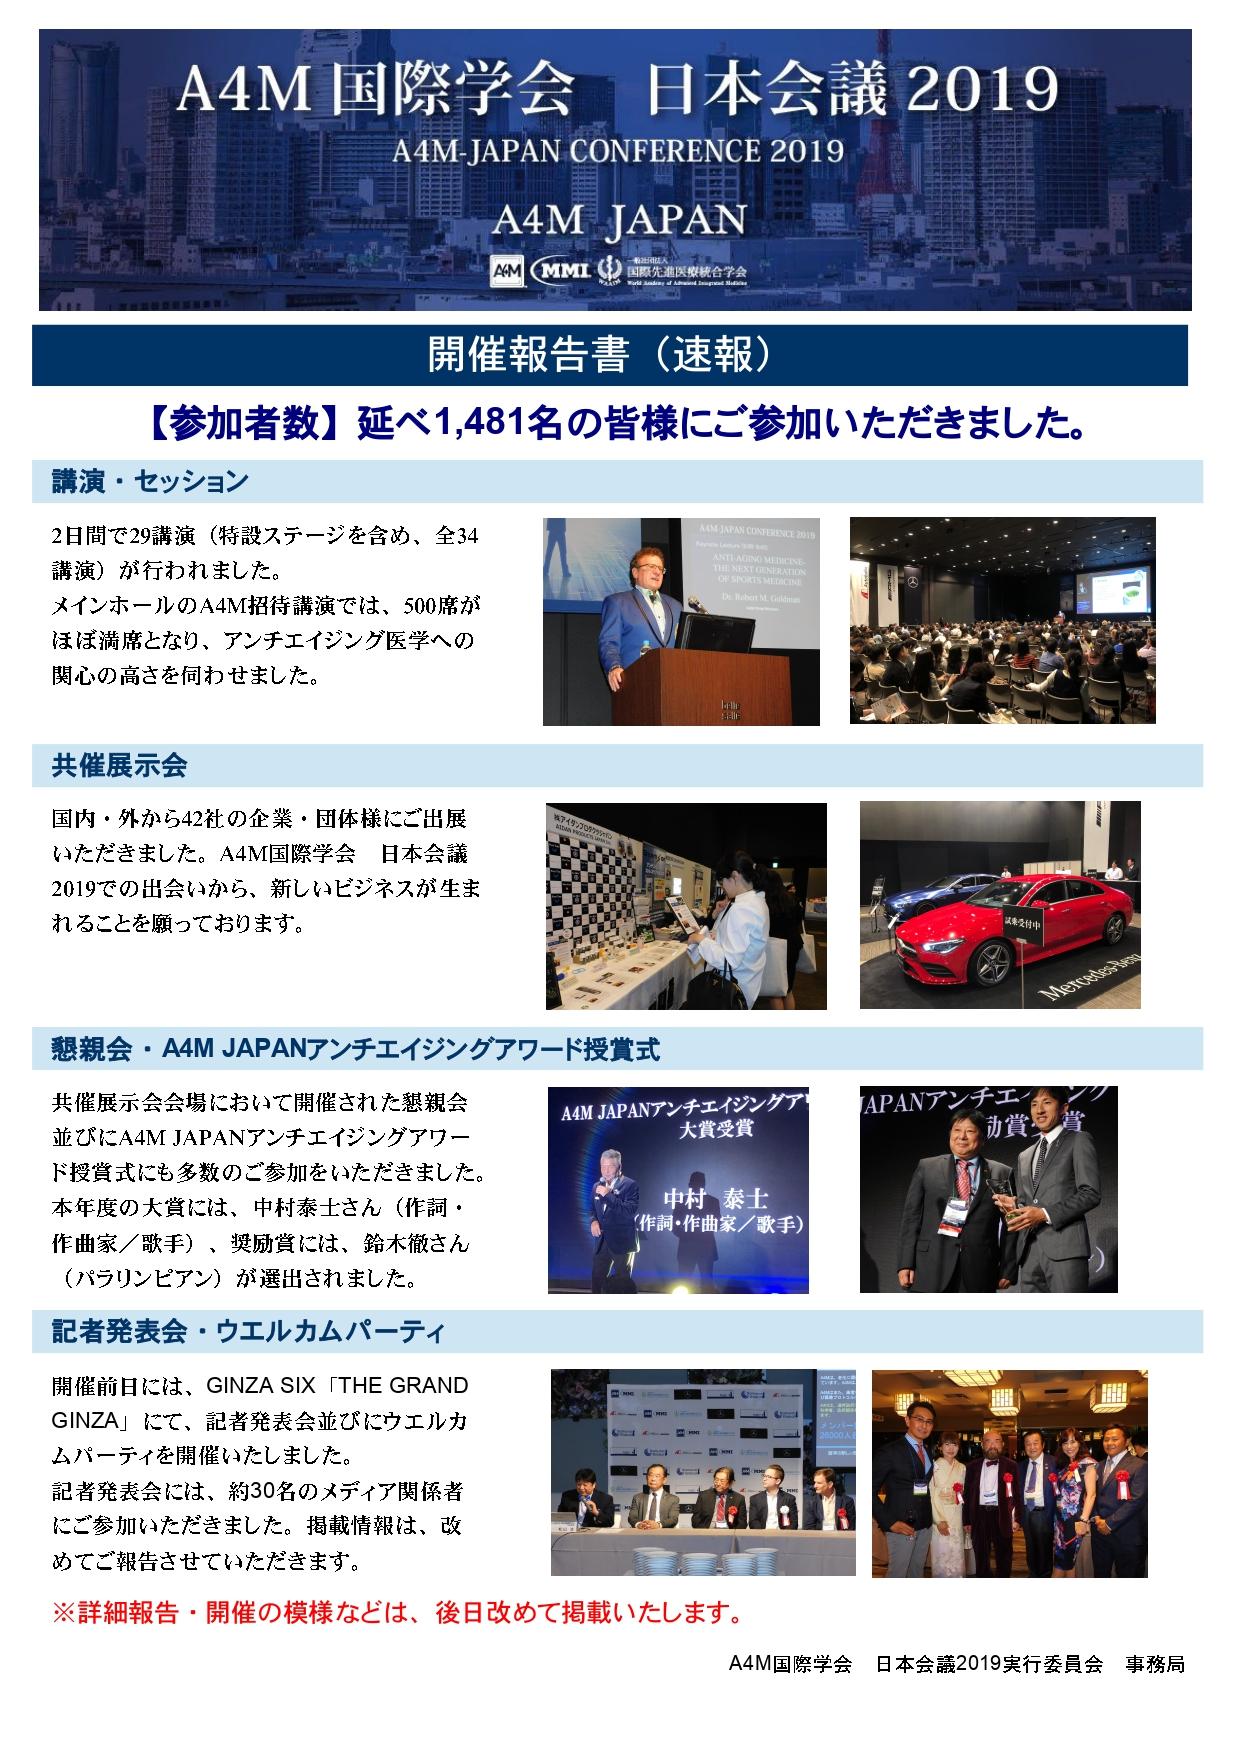 【A4M国際学会日本会議2019】開催報告書(速報)